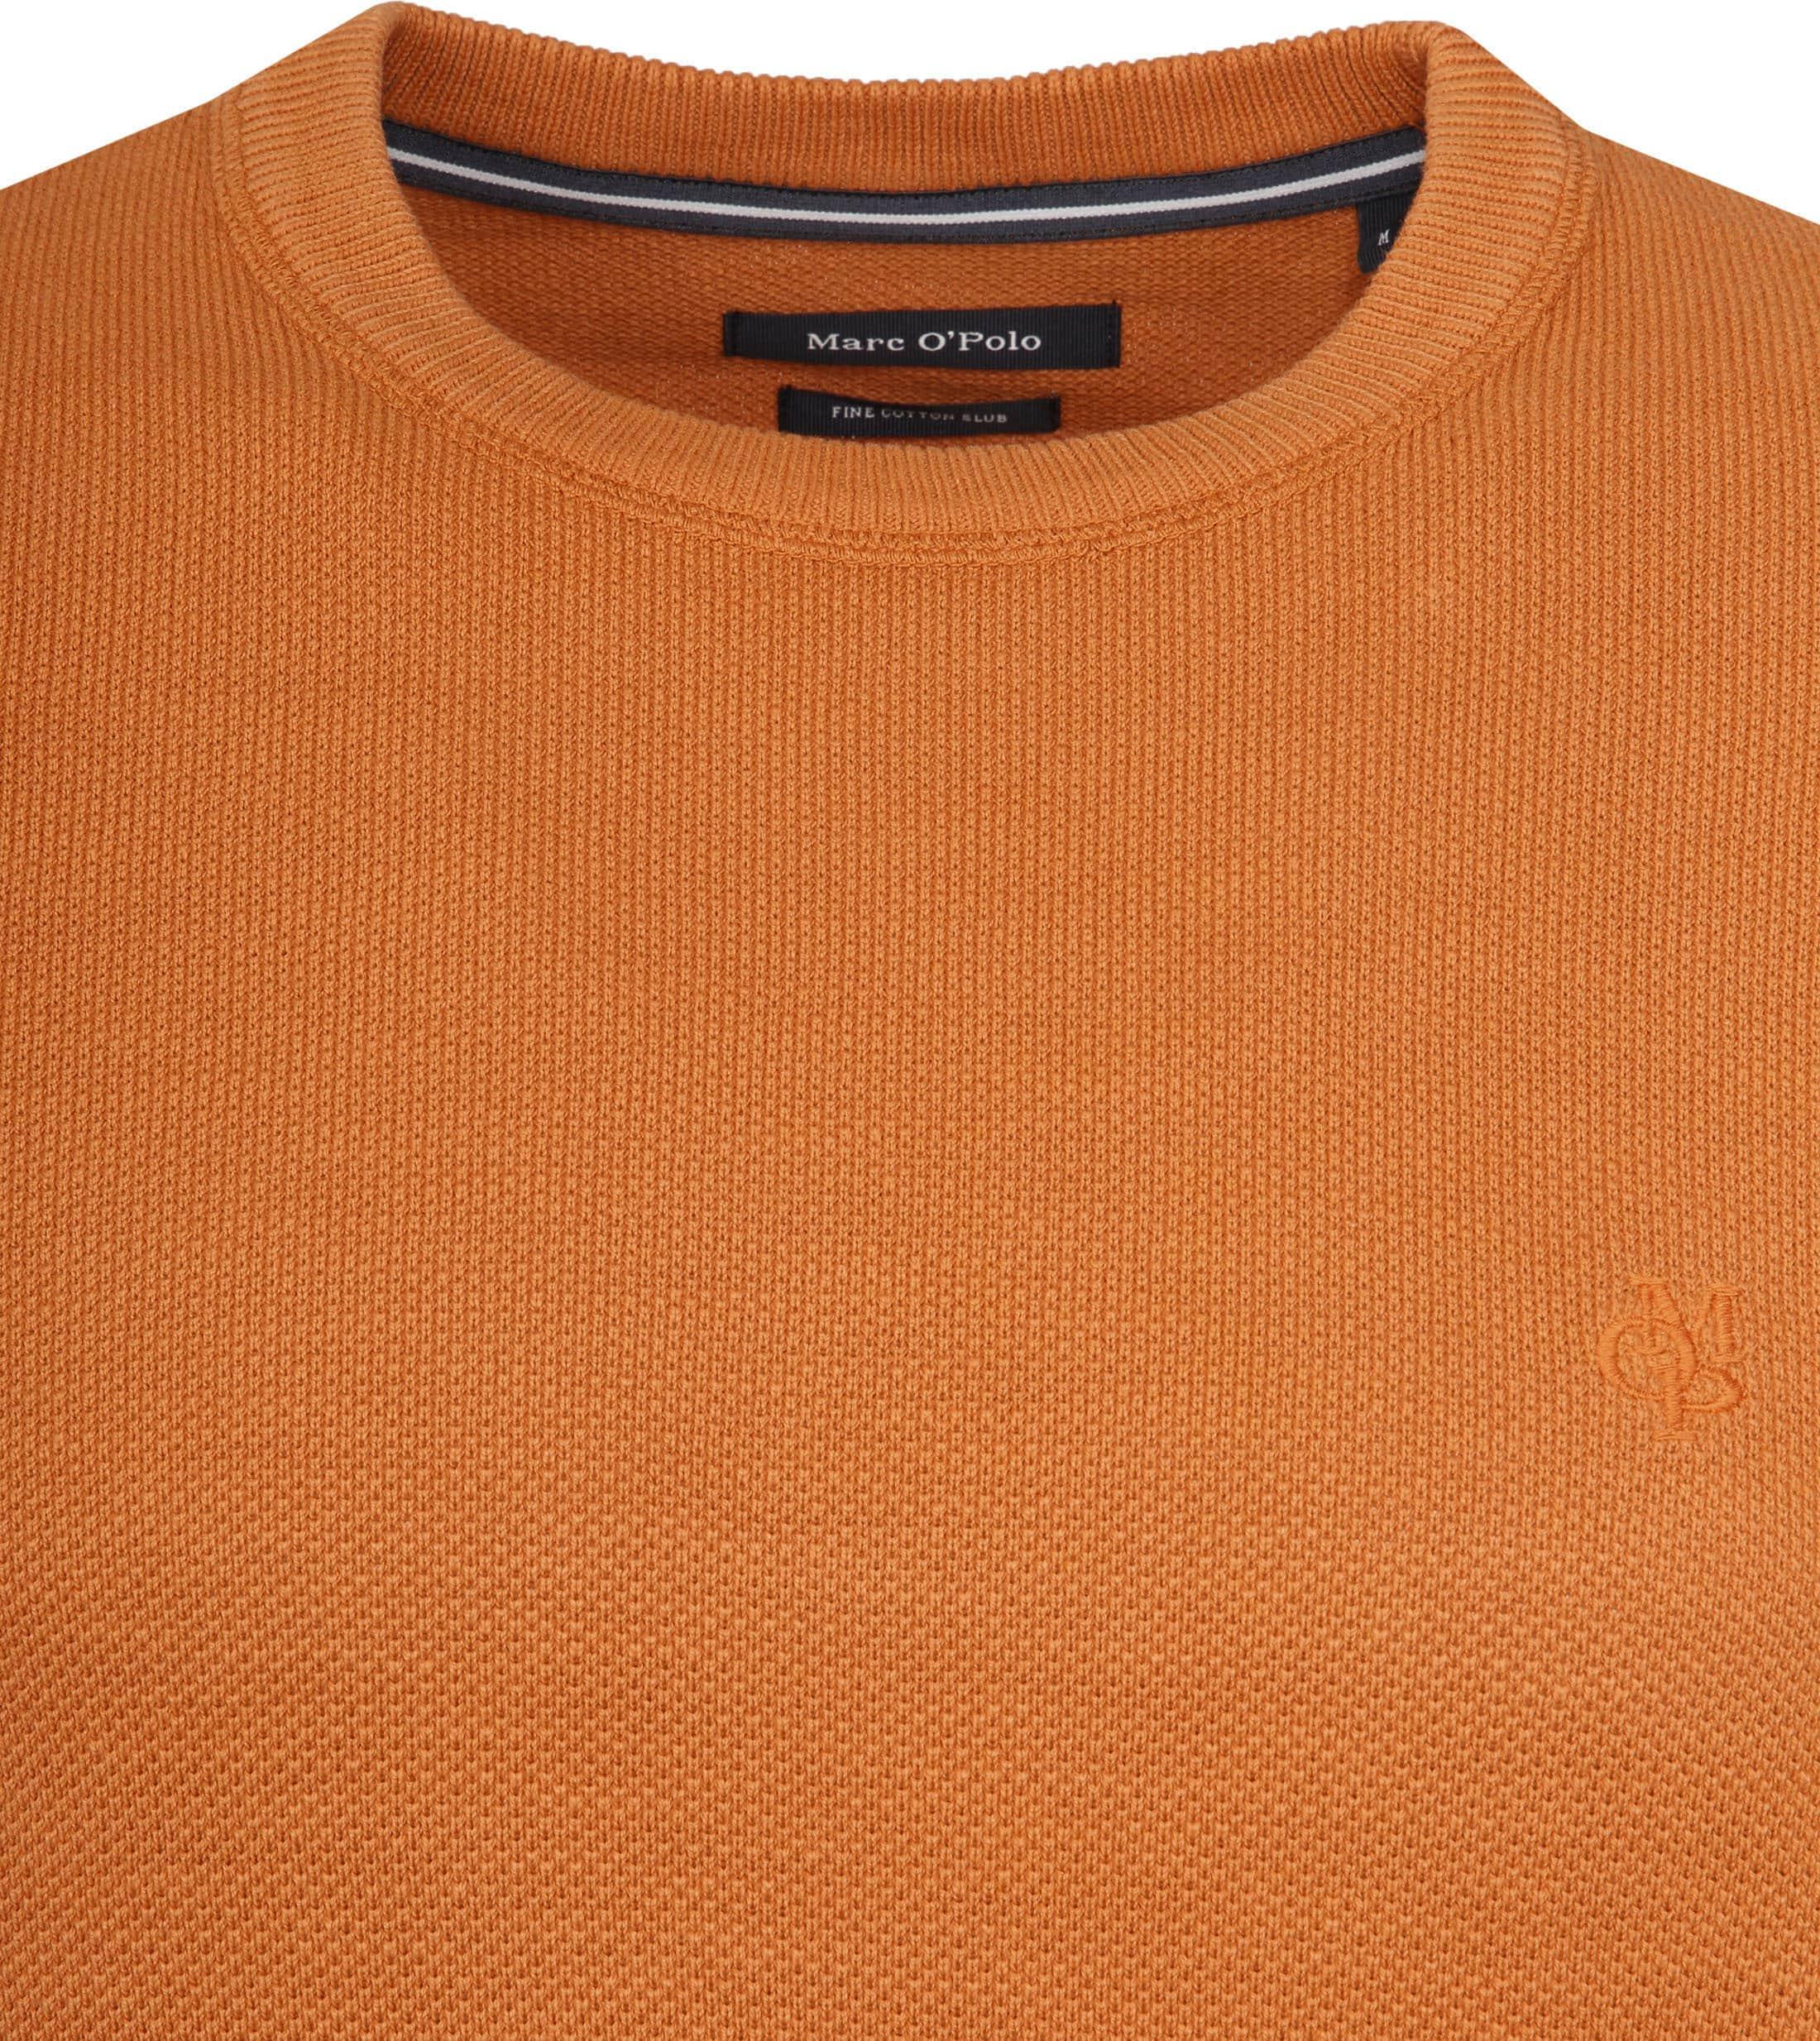 Marc O'Polo Trui Dessin Oranje